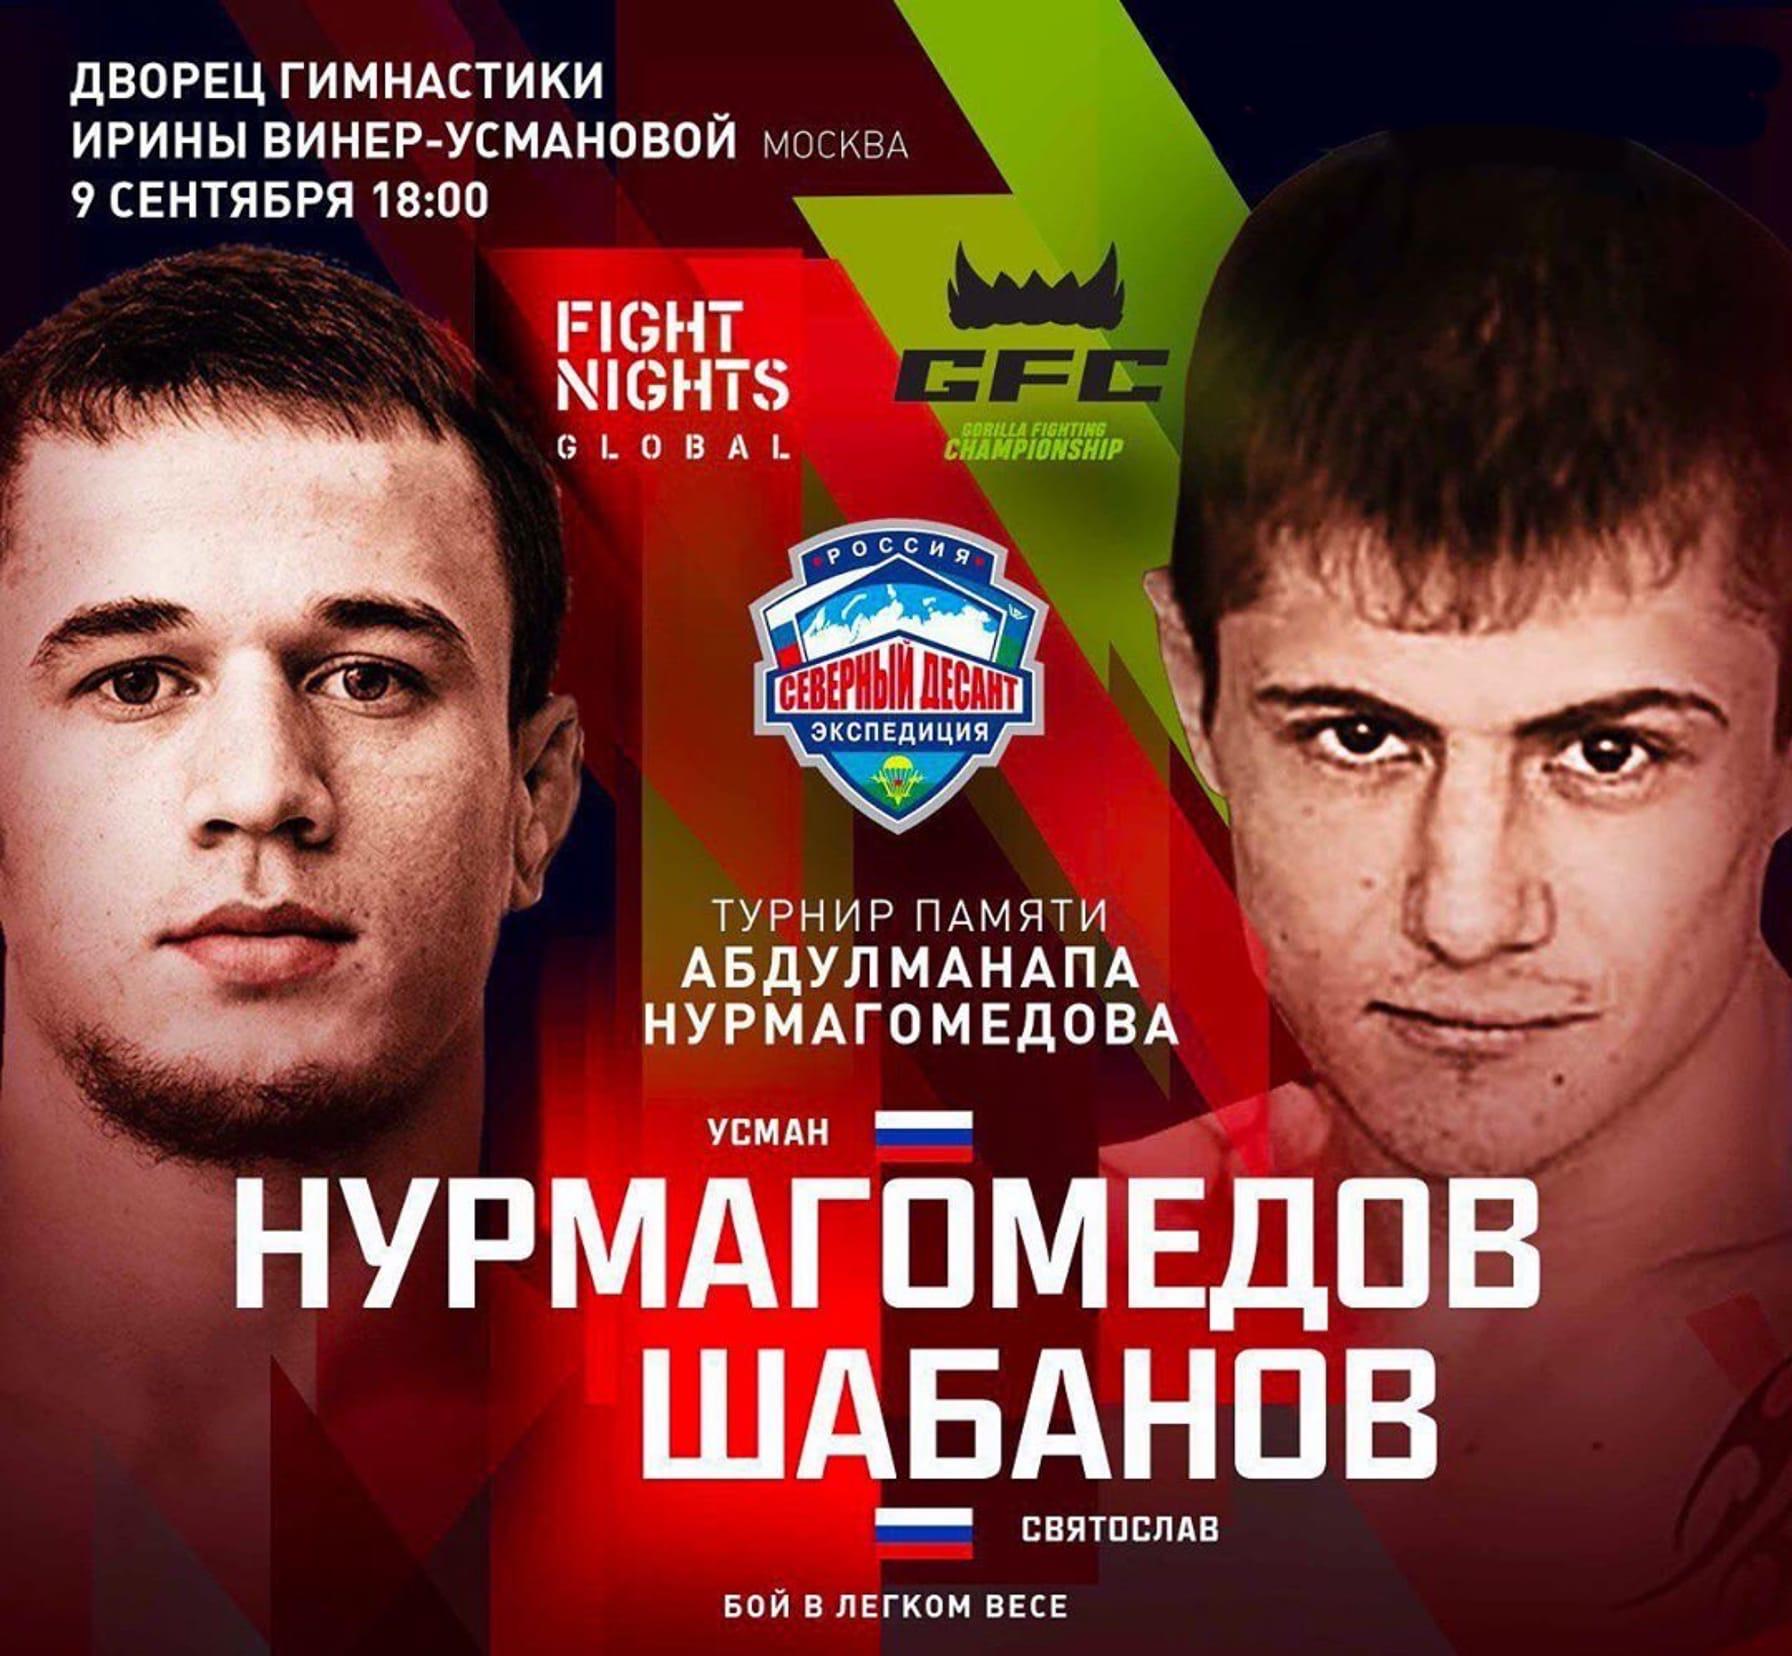 Усман Нурмагомедов — Святослав Шабанов прогноз и ставка на бой